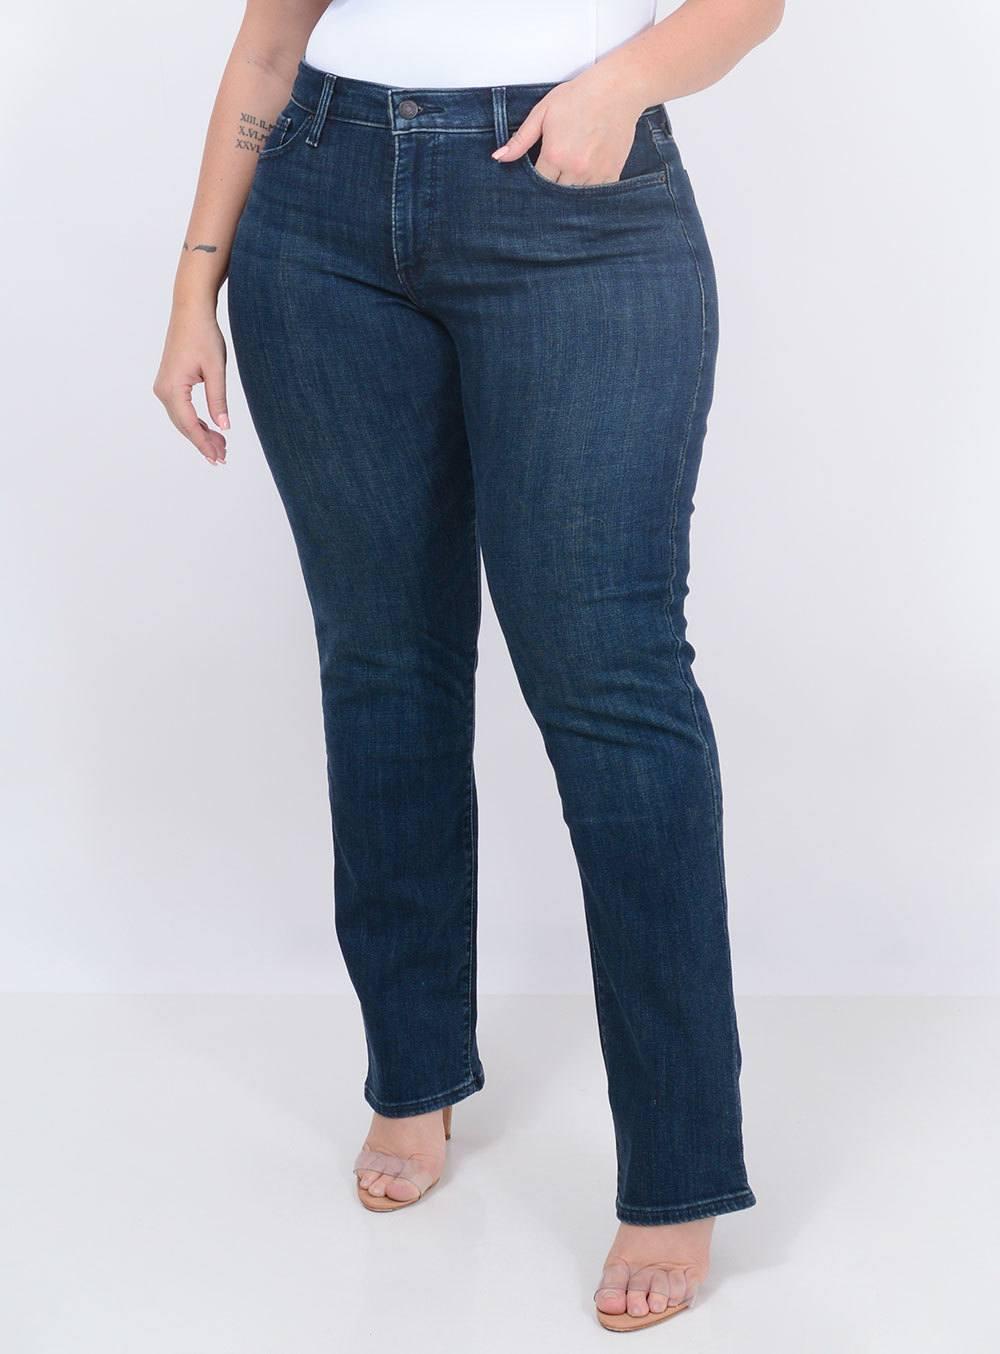 Calça Levi's Jeans Feminina 314 Shaping Straight ref. LV196410009